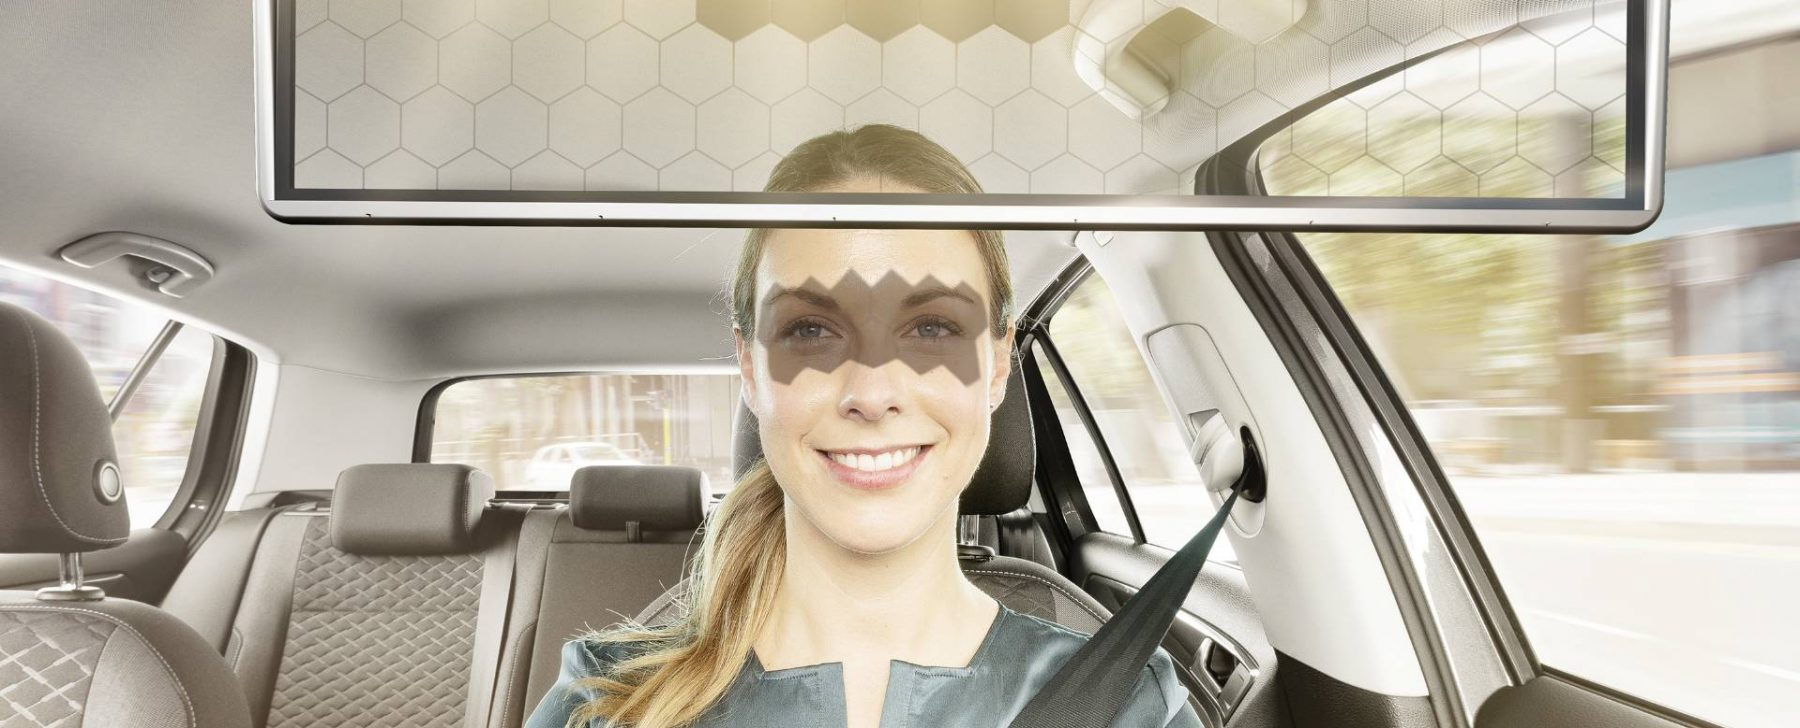 tecnologia automovil